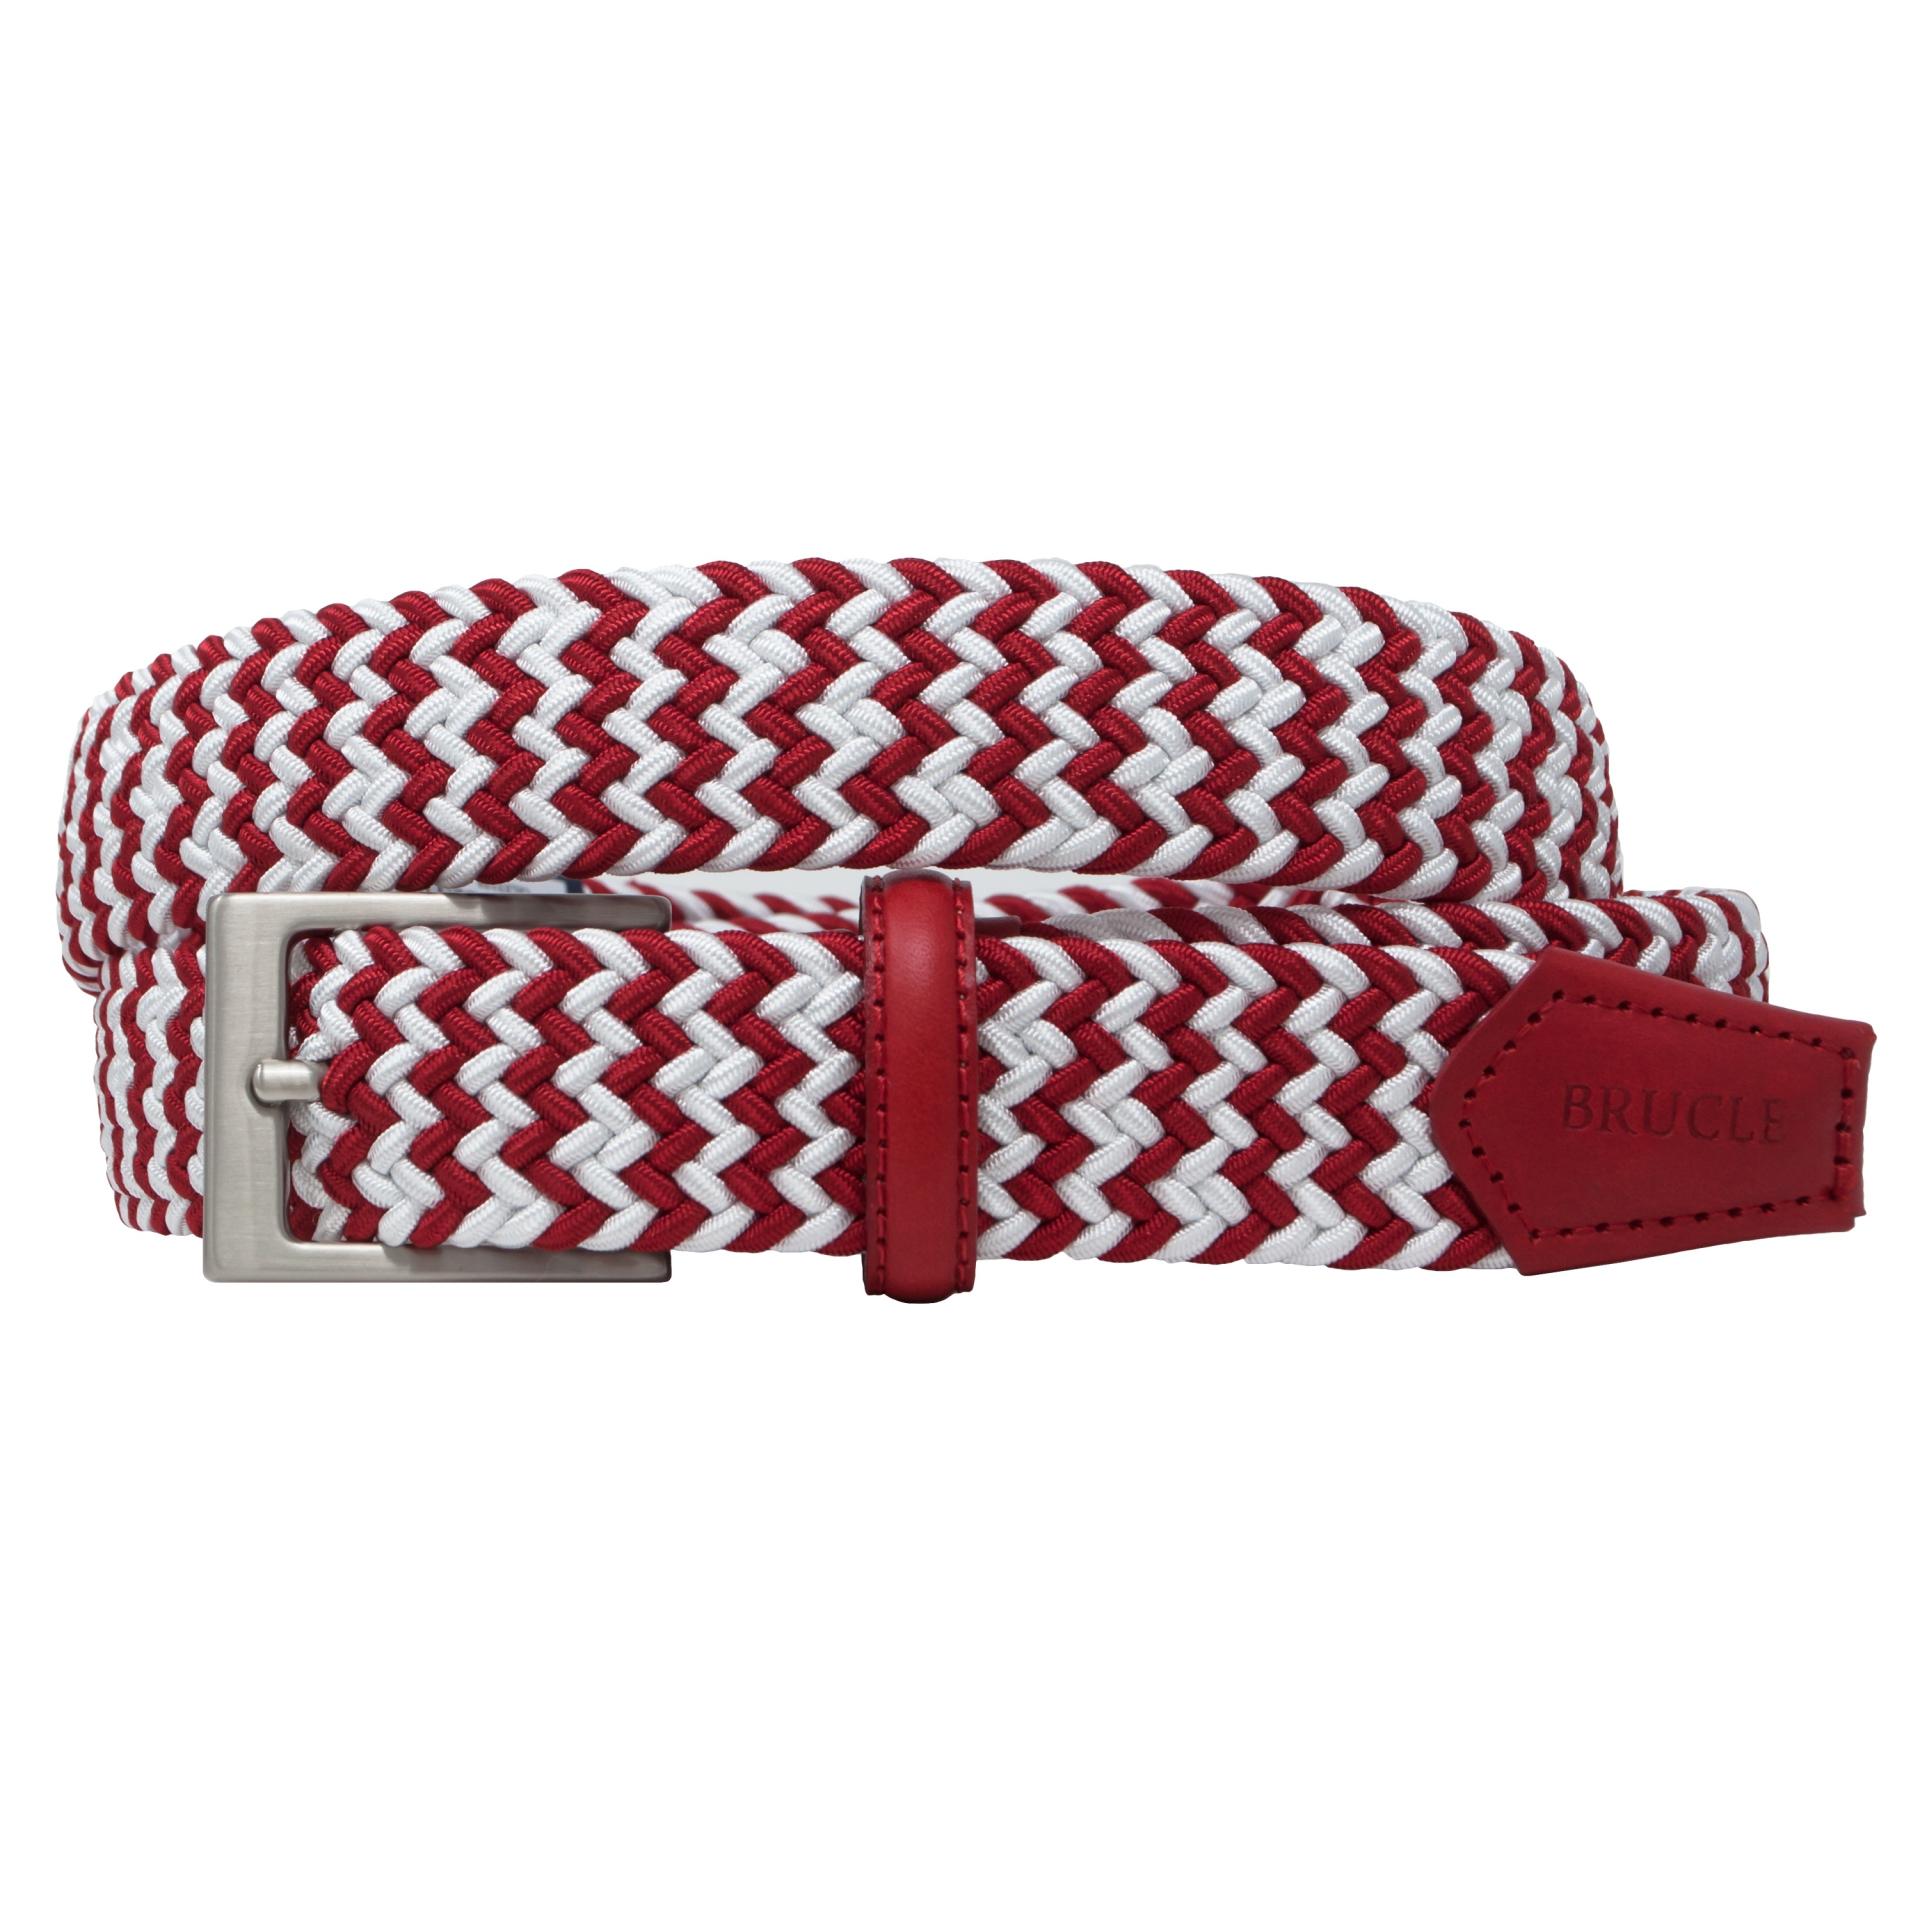 Cintura intrecciata elastica bicolore bianca e rossa